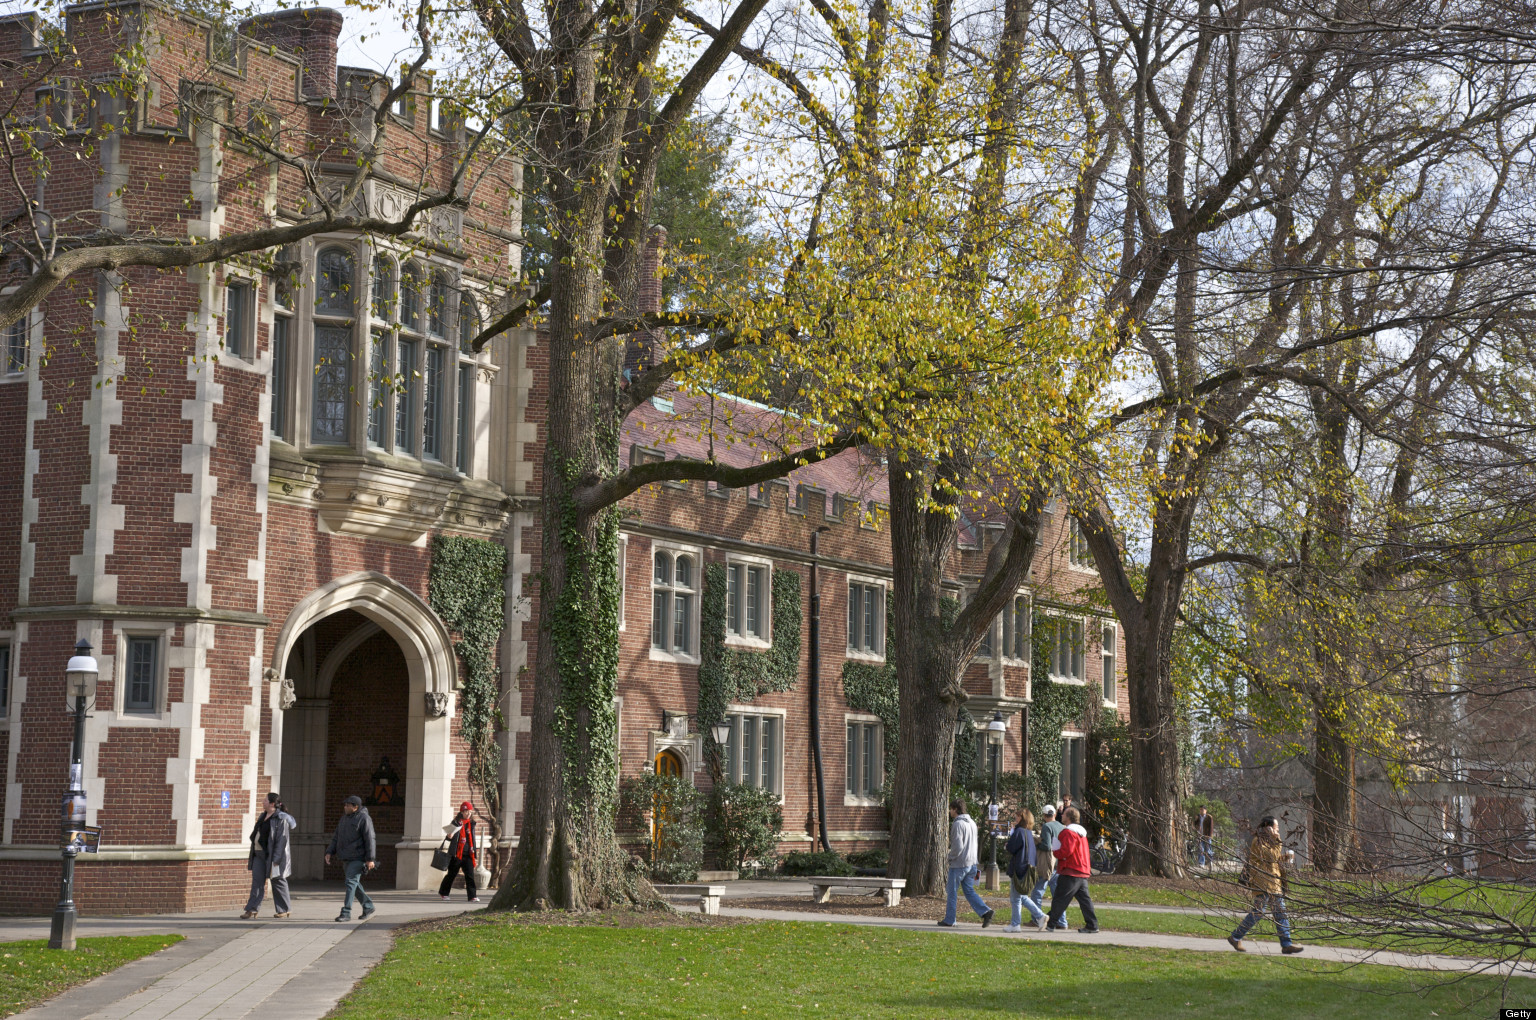 princeton bomb threat prompts campus evacuation update